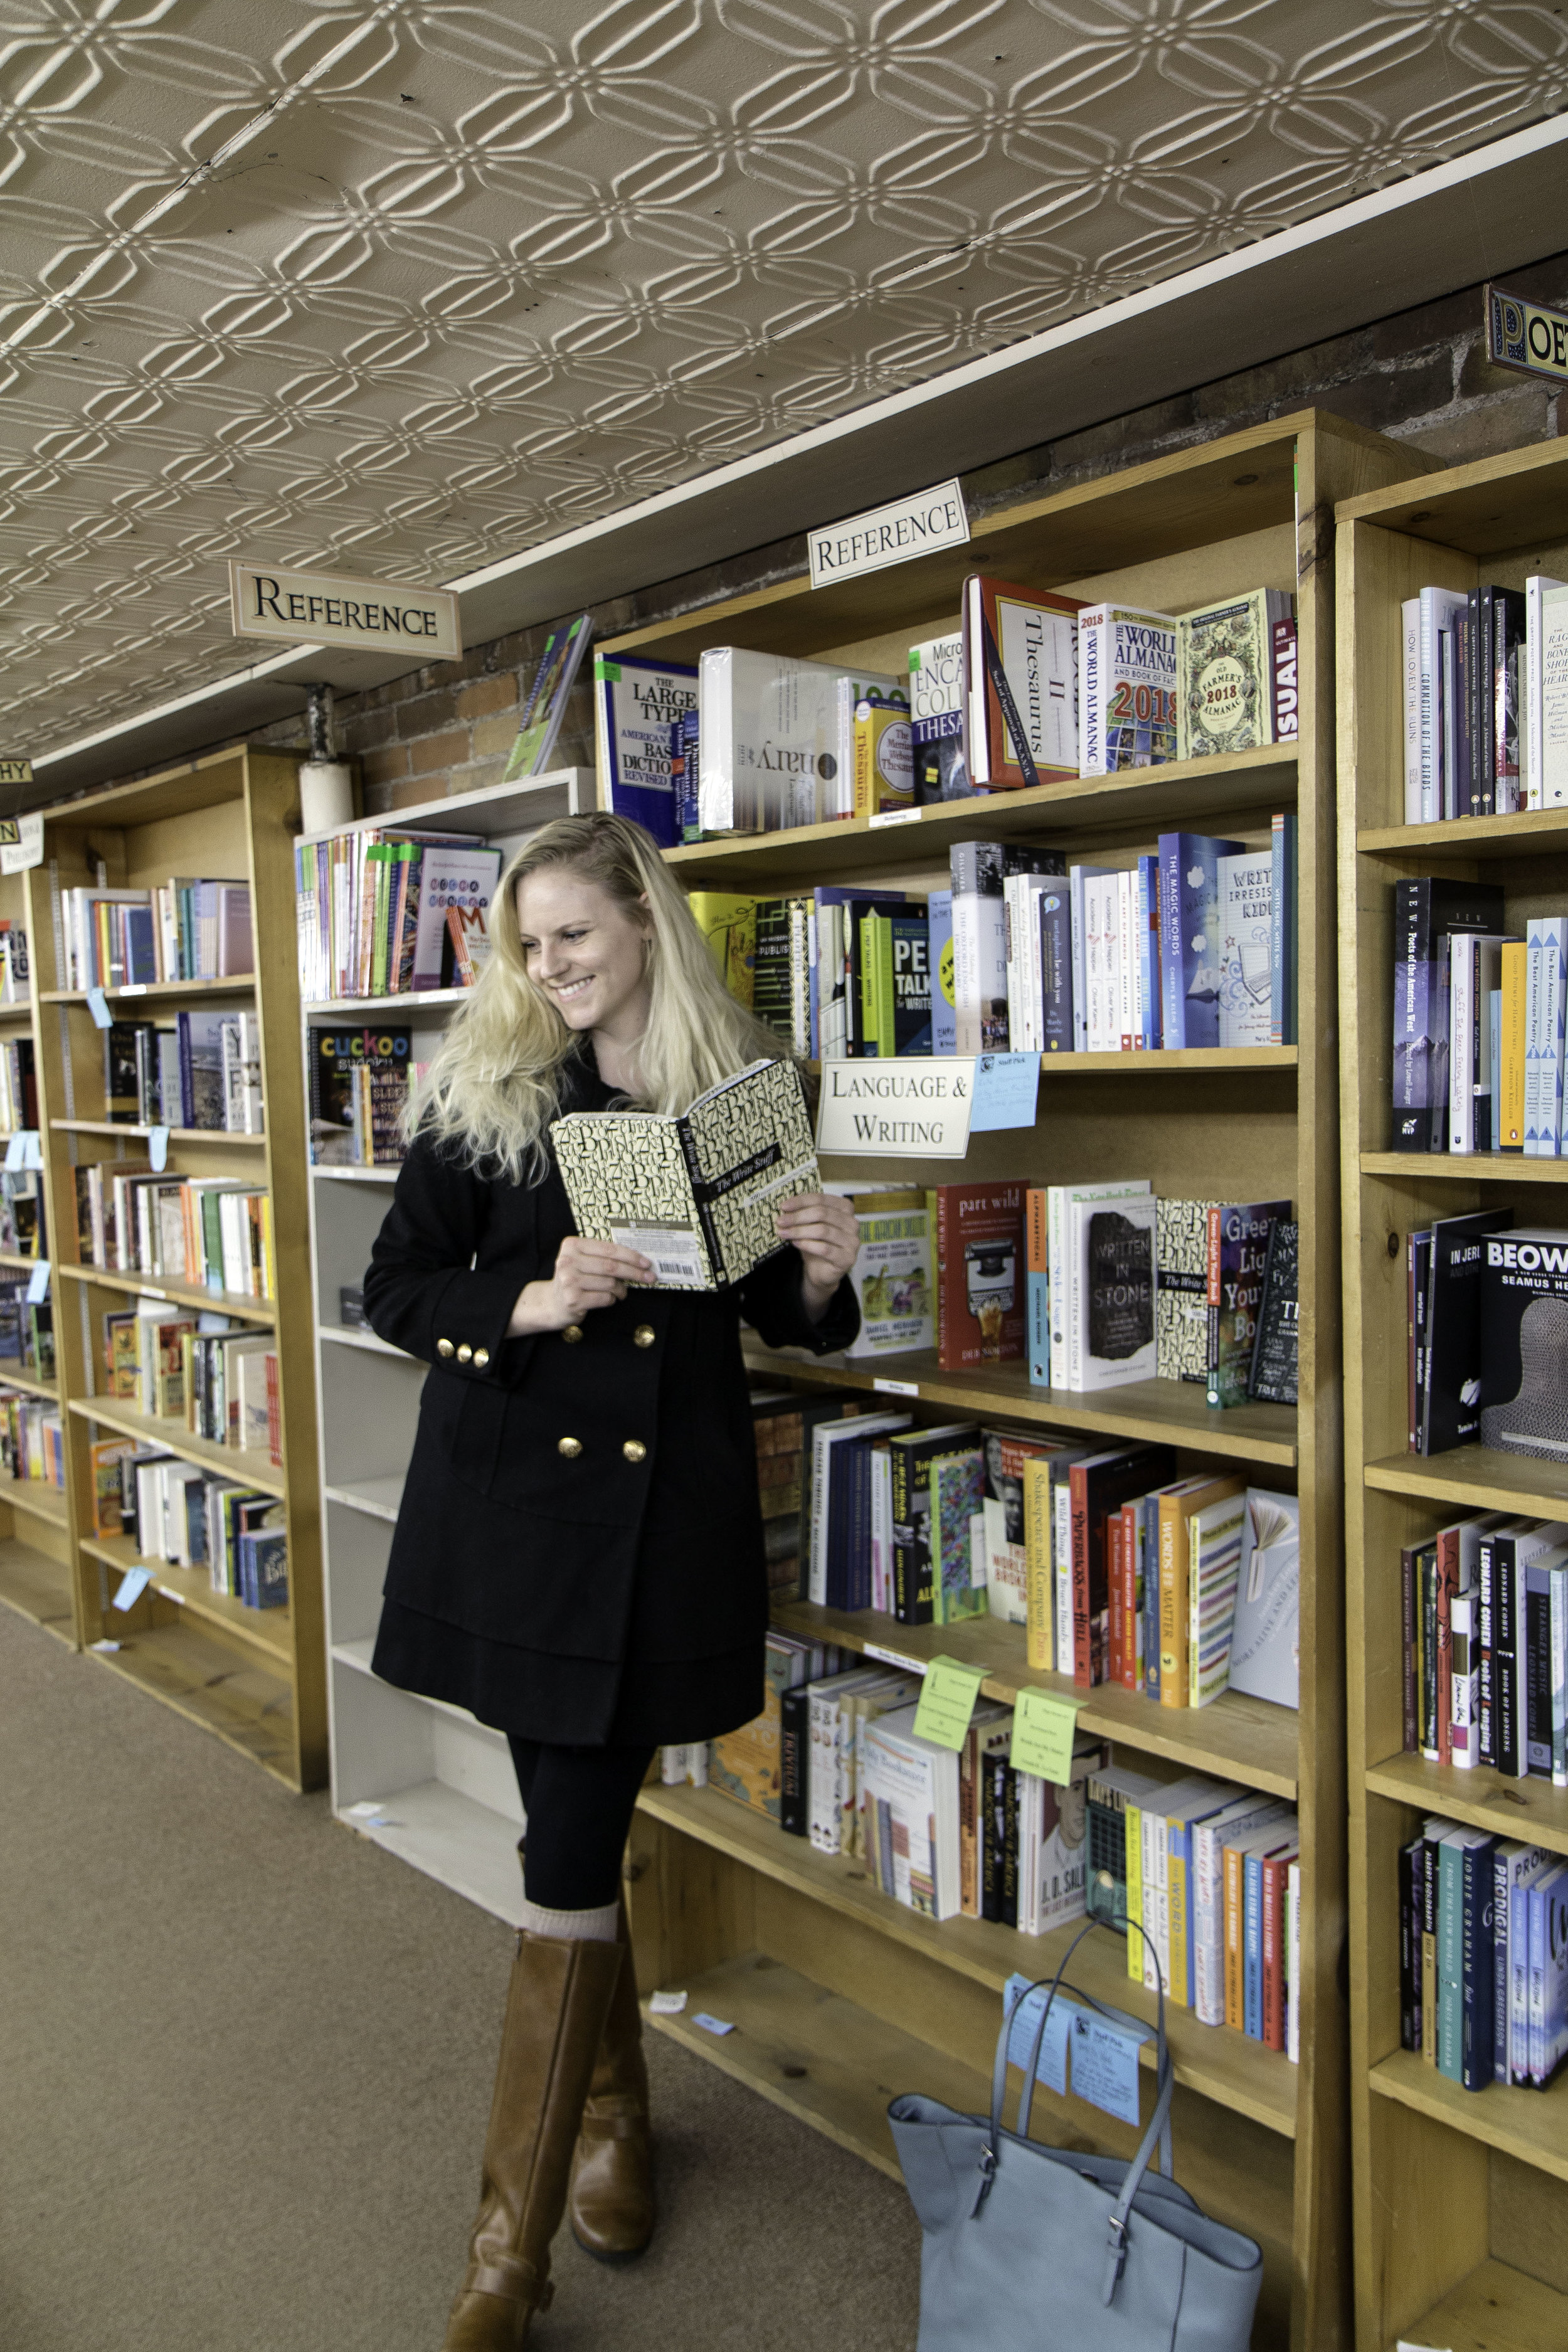 Country Bookshelf in Downtown Bozeman, Montana